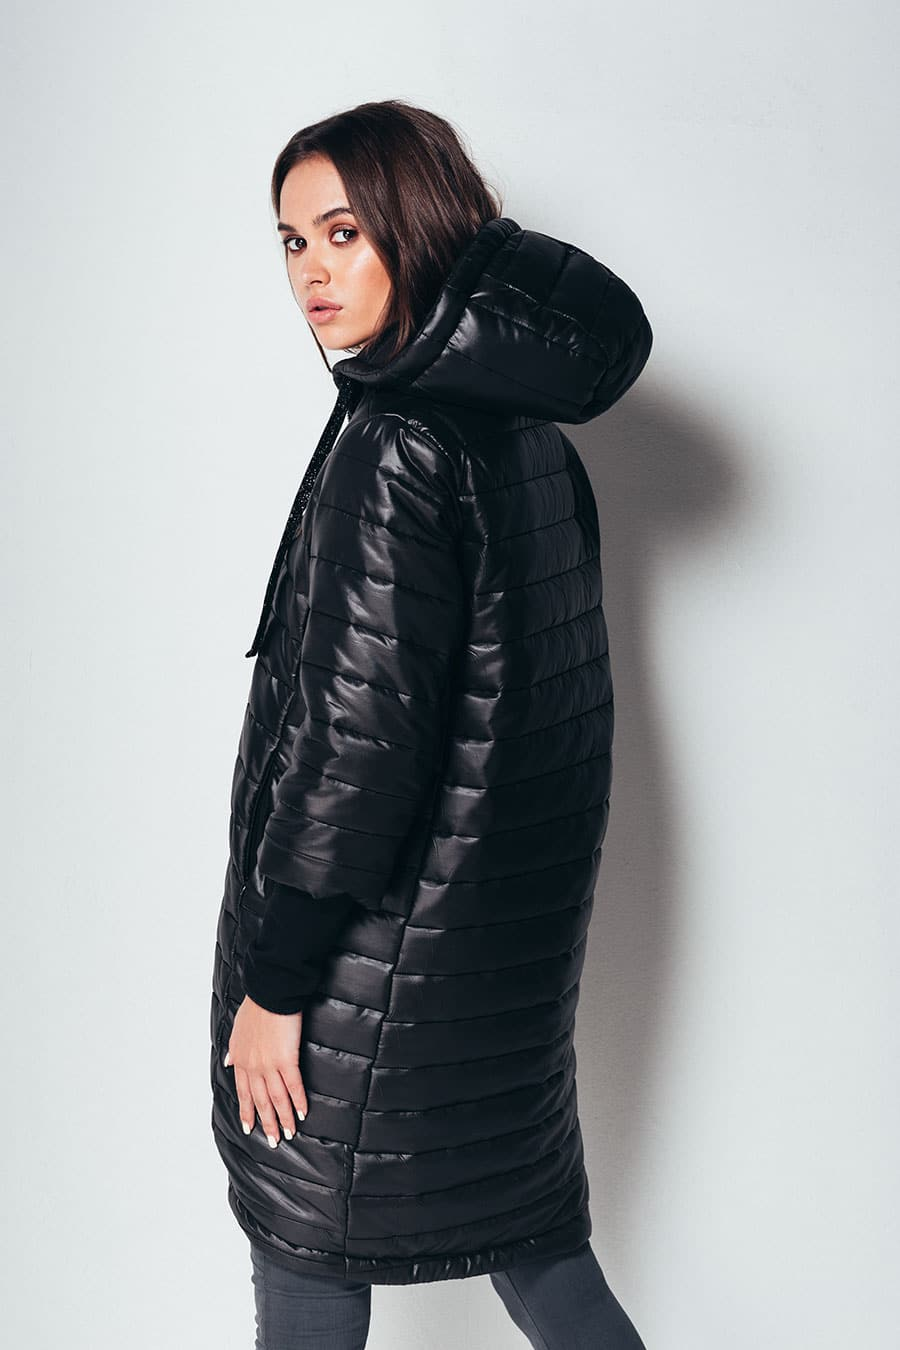 jagger internet prodavnica kolekcija jesen zima 2021 zenska jakna jg 6234 01 3